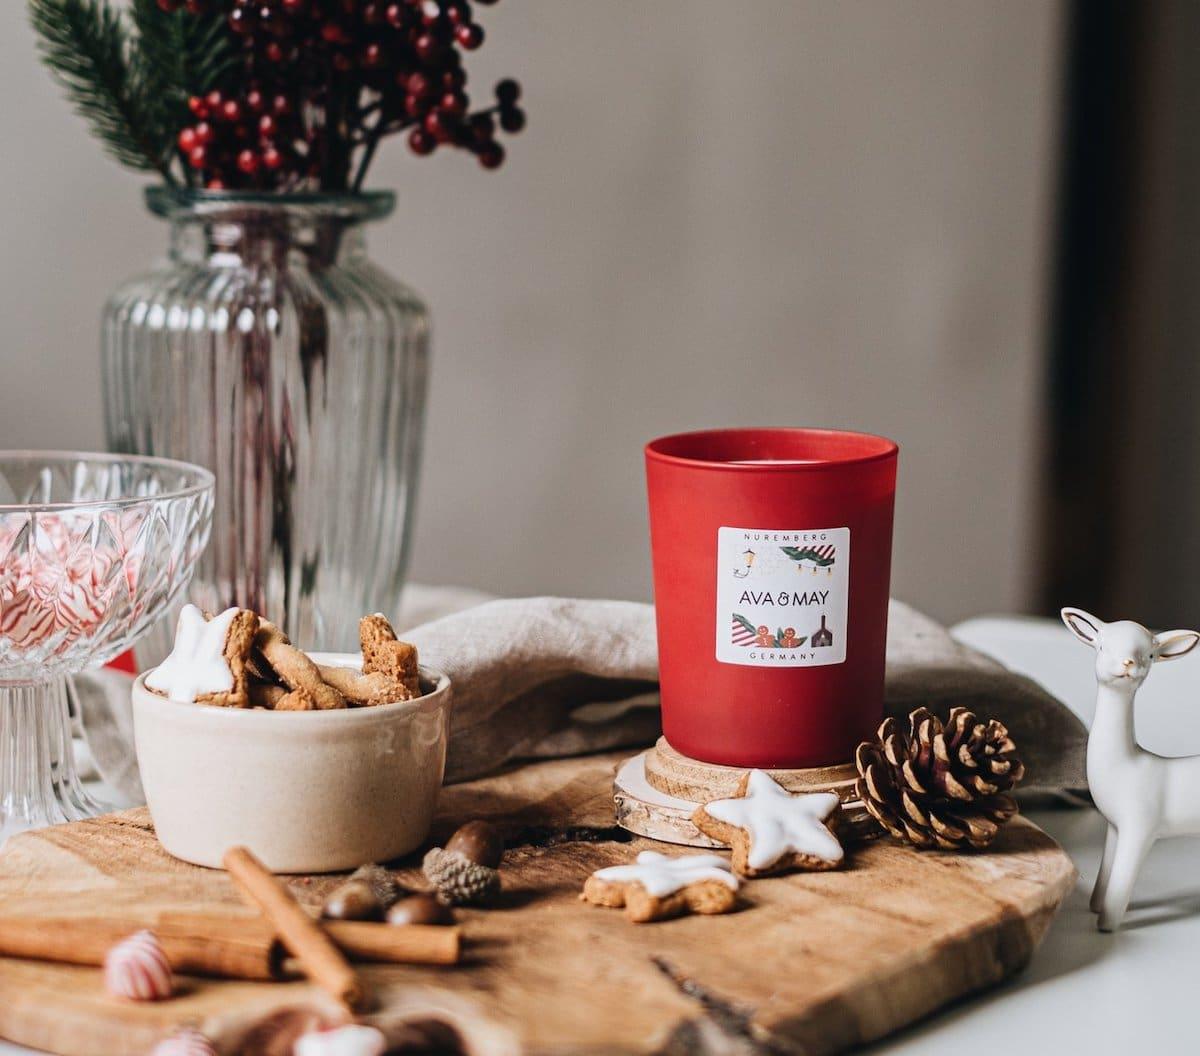 NÜRNBERG Ava and May Duftkerze Erfahrungen Weihnachten Duft Ingwer Nelke Zimt Kerze Bewerttung Germany